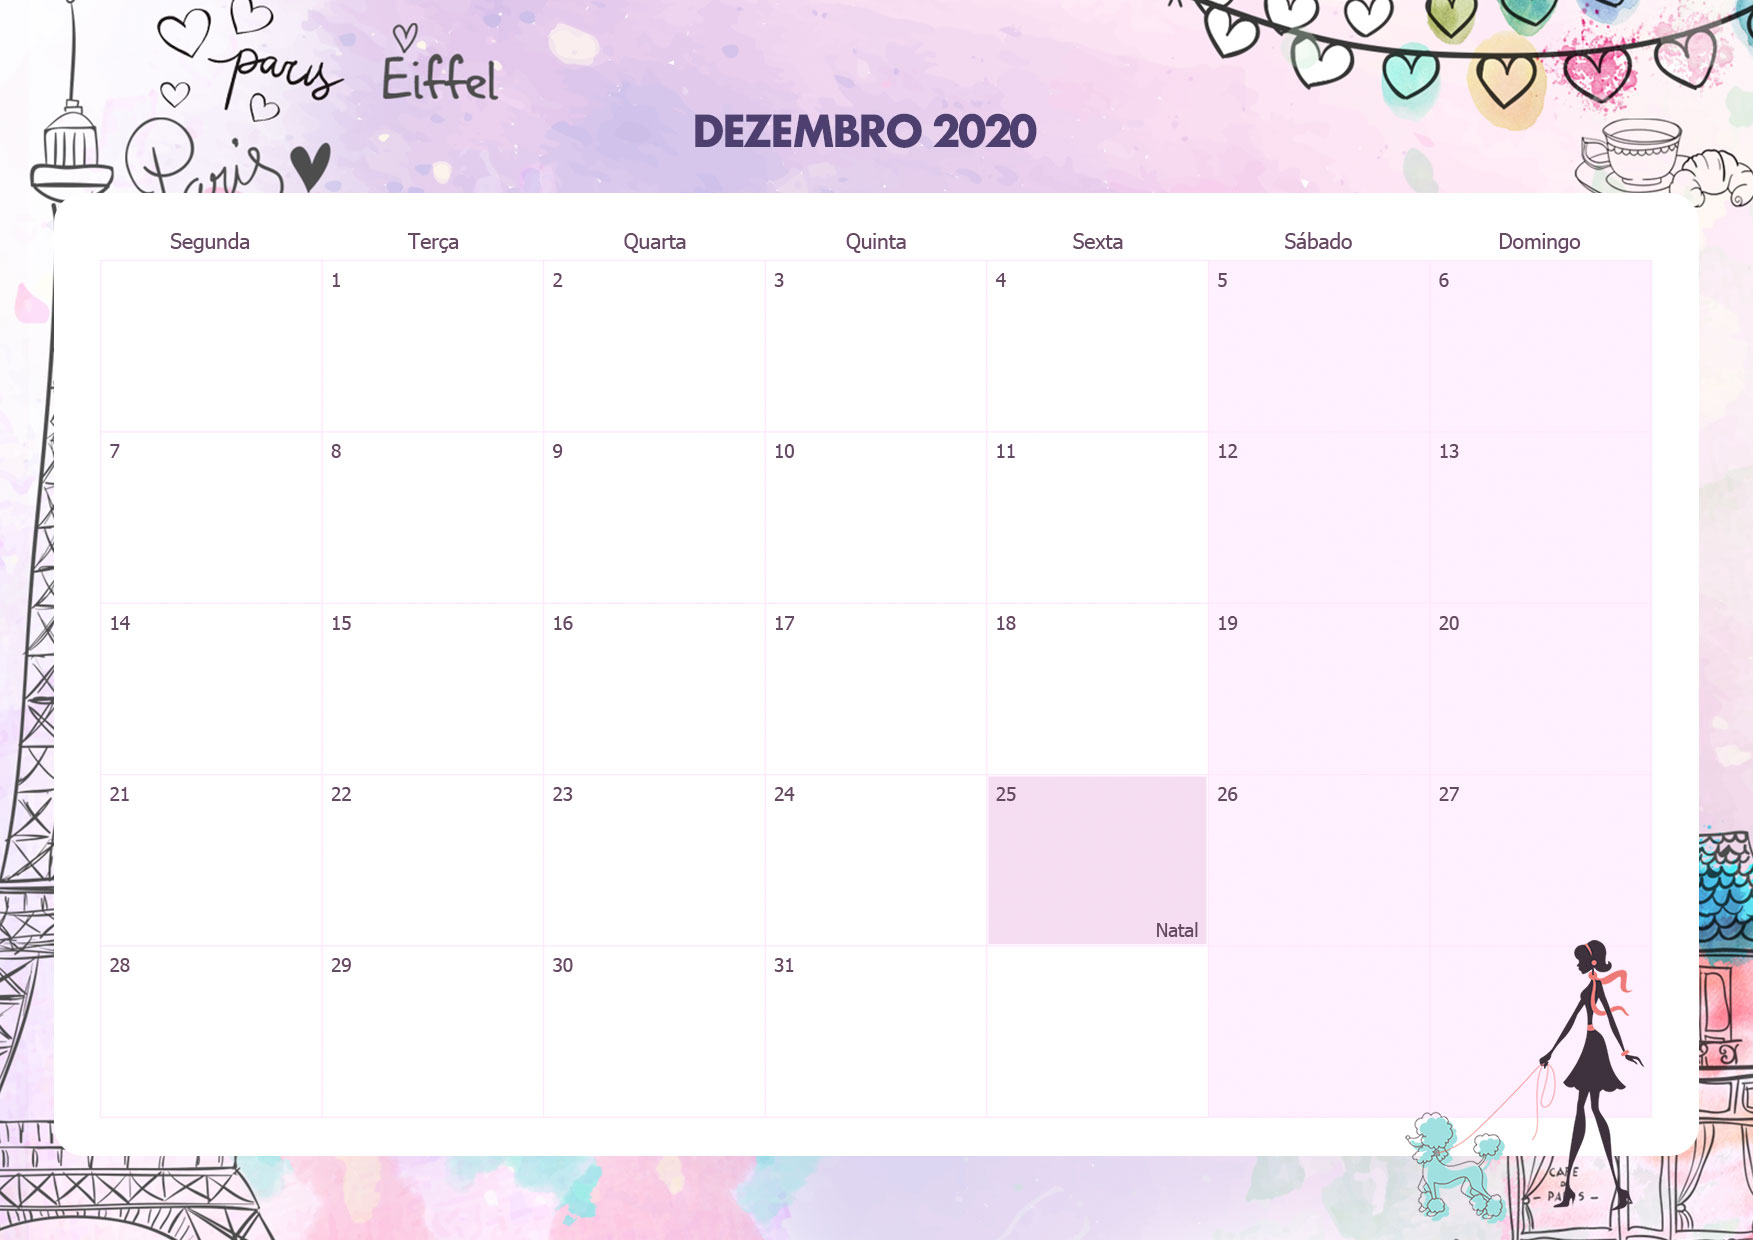 Calendario Mensal Paris Dezembro 2020